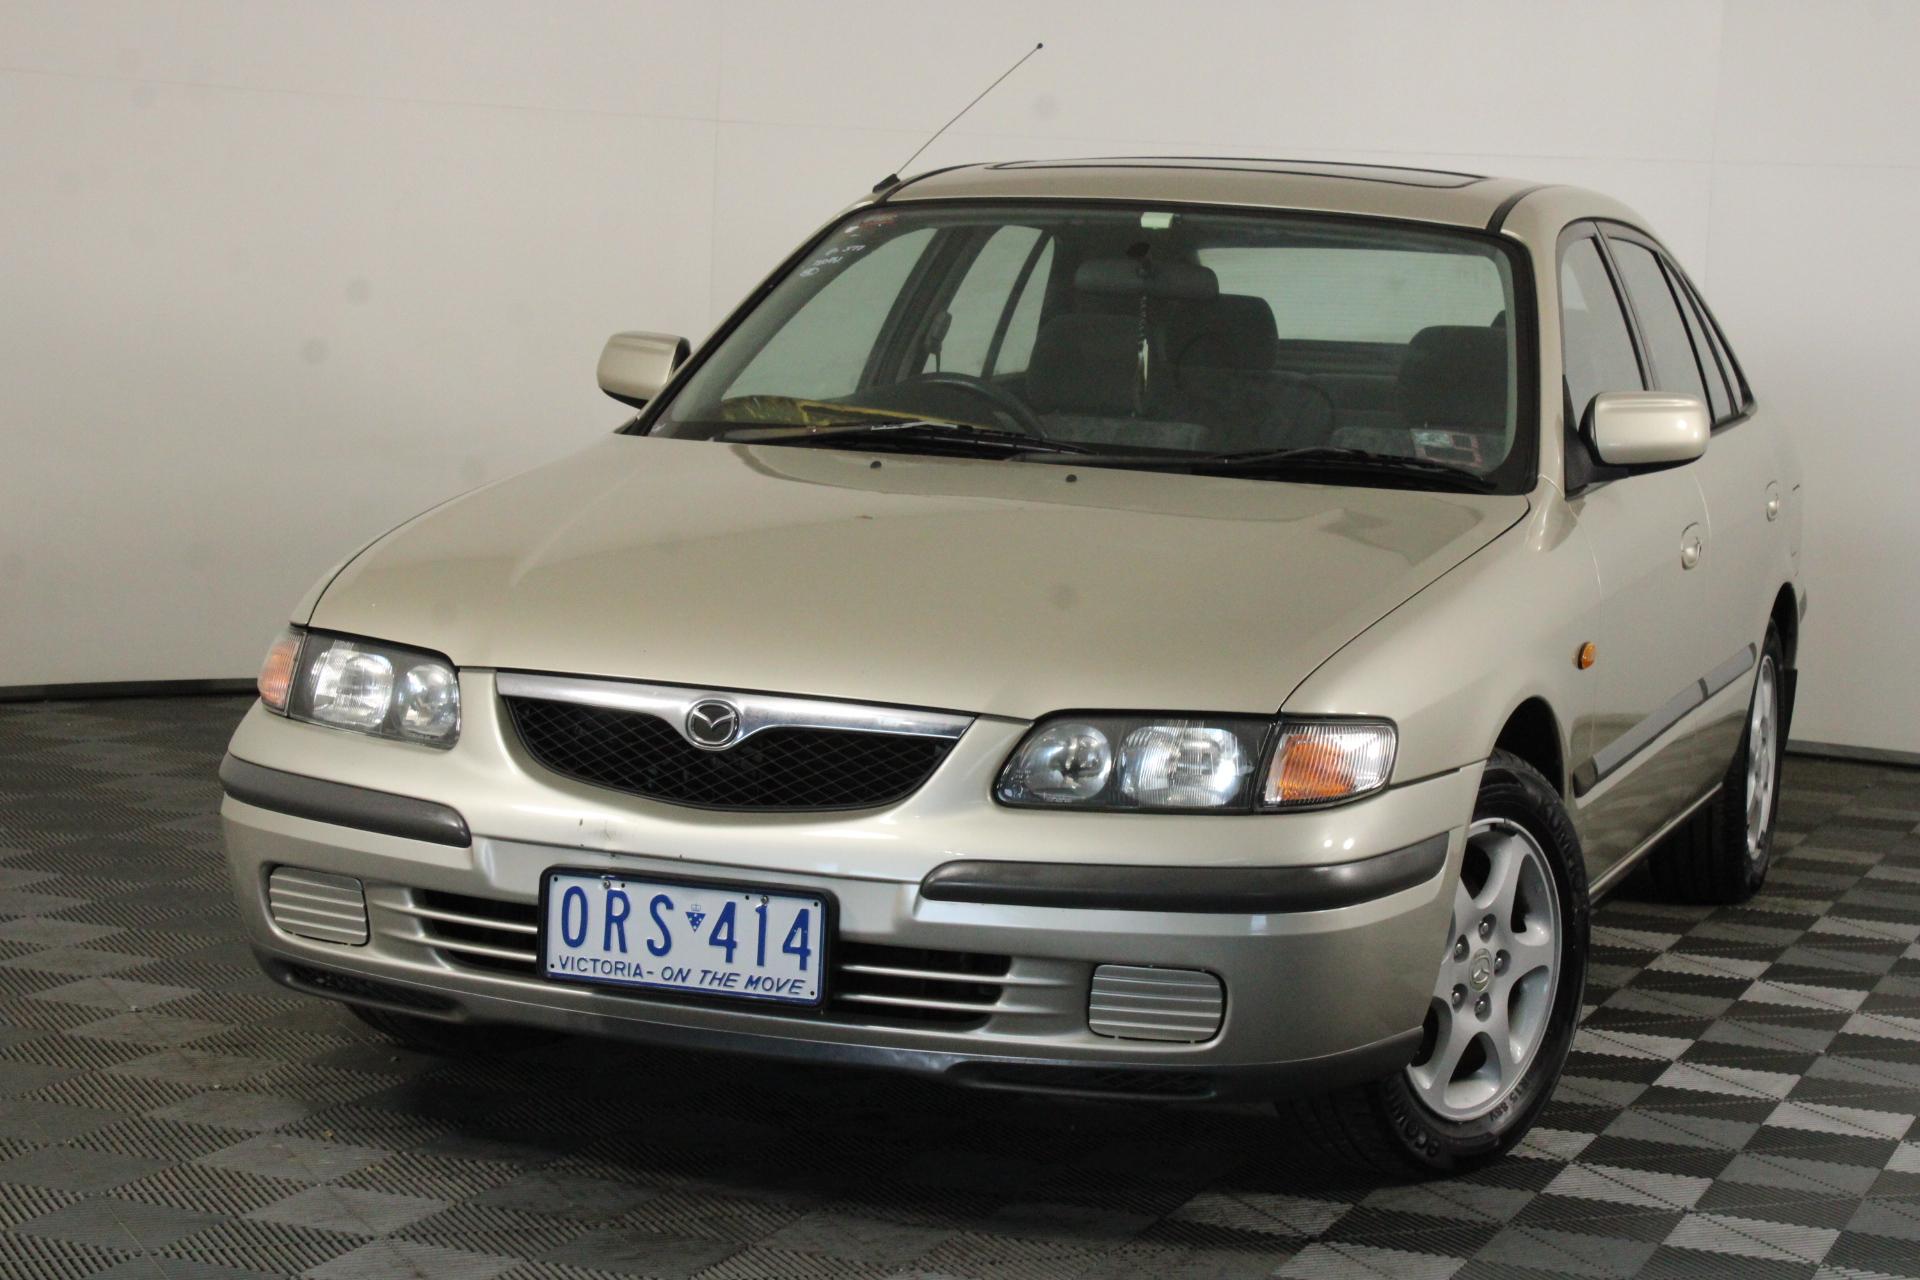 1997 Mazda 626 Luxury GF Automatic Hatchback